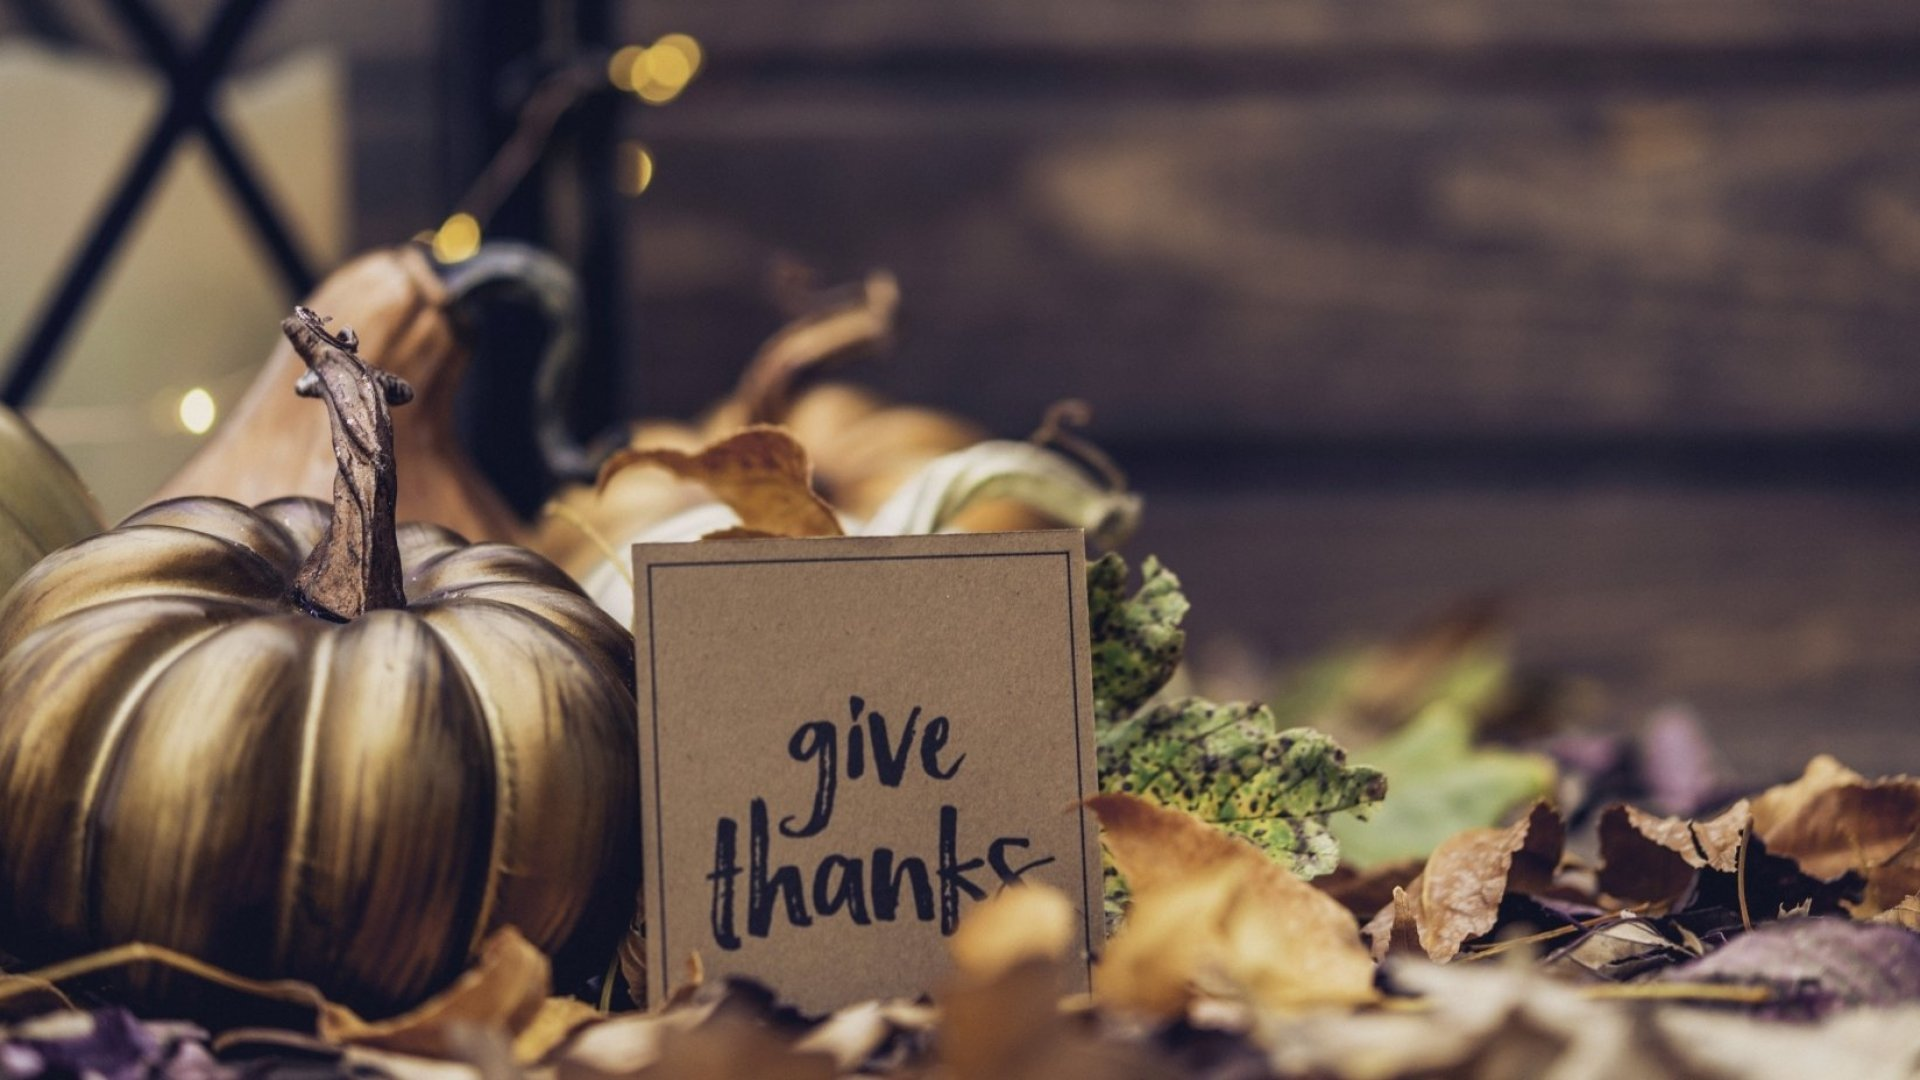 6 Reasons to Appreciate Entrepreneurship This Thanksgiving